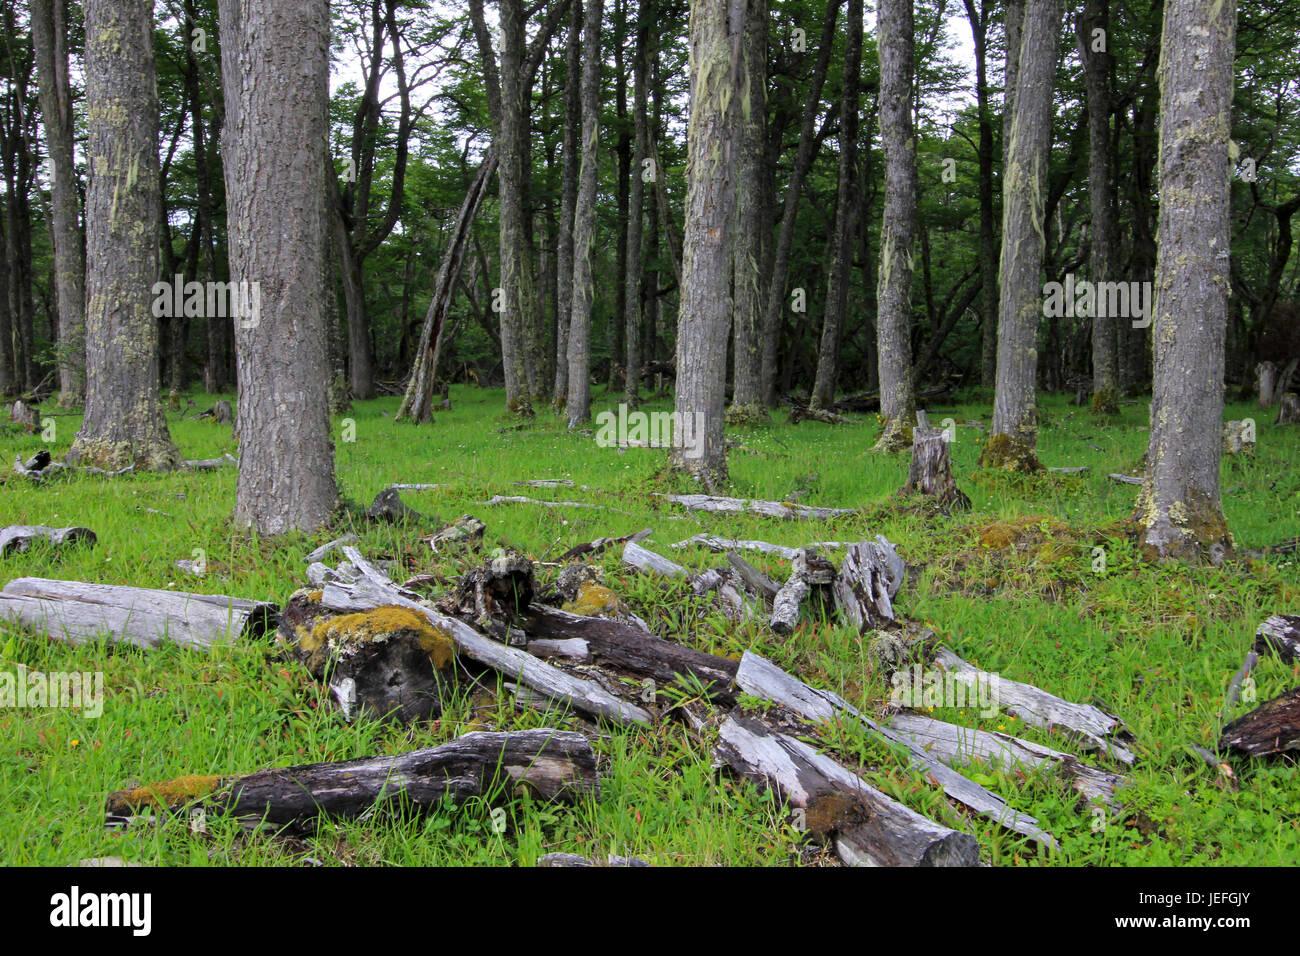 Nice forest, near Villa O'Higgins, Carretera Australl, Patagonia Chile - Stock Image